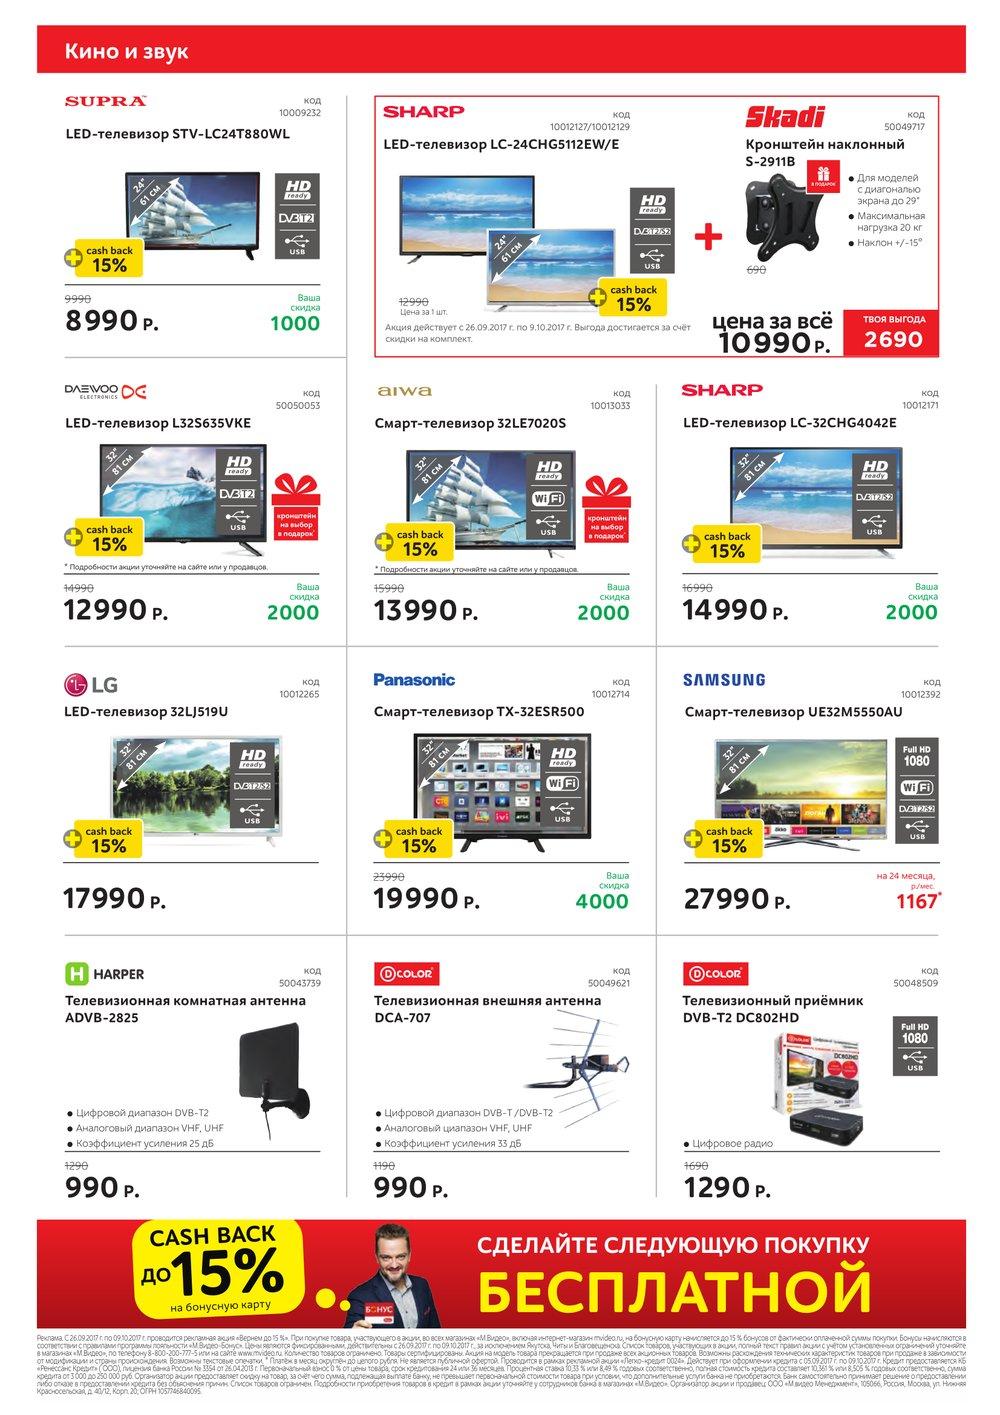 Каталог акций М.Видео с 26 сентября по 9 октября 2017 - стр. 2